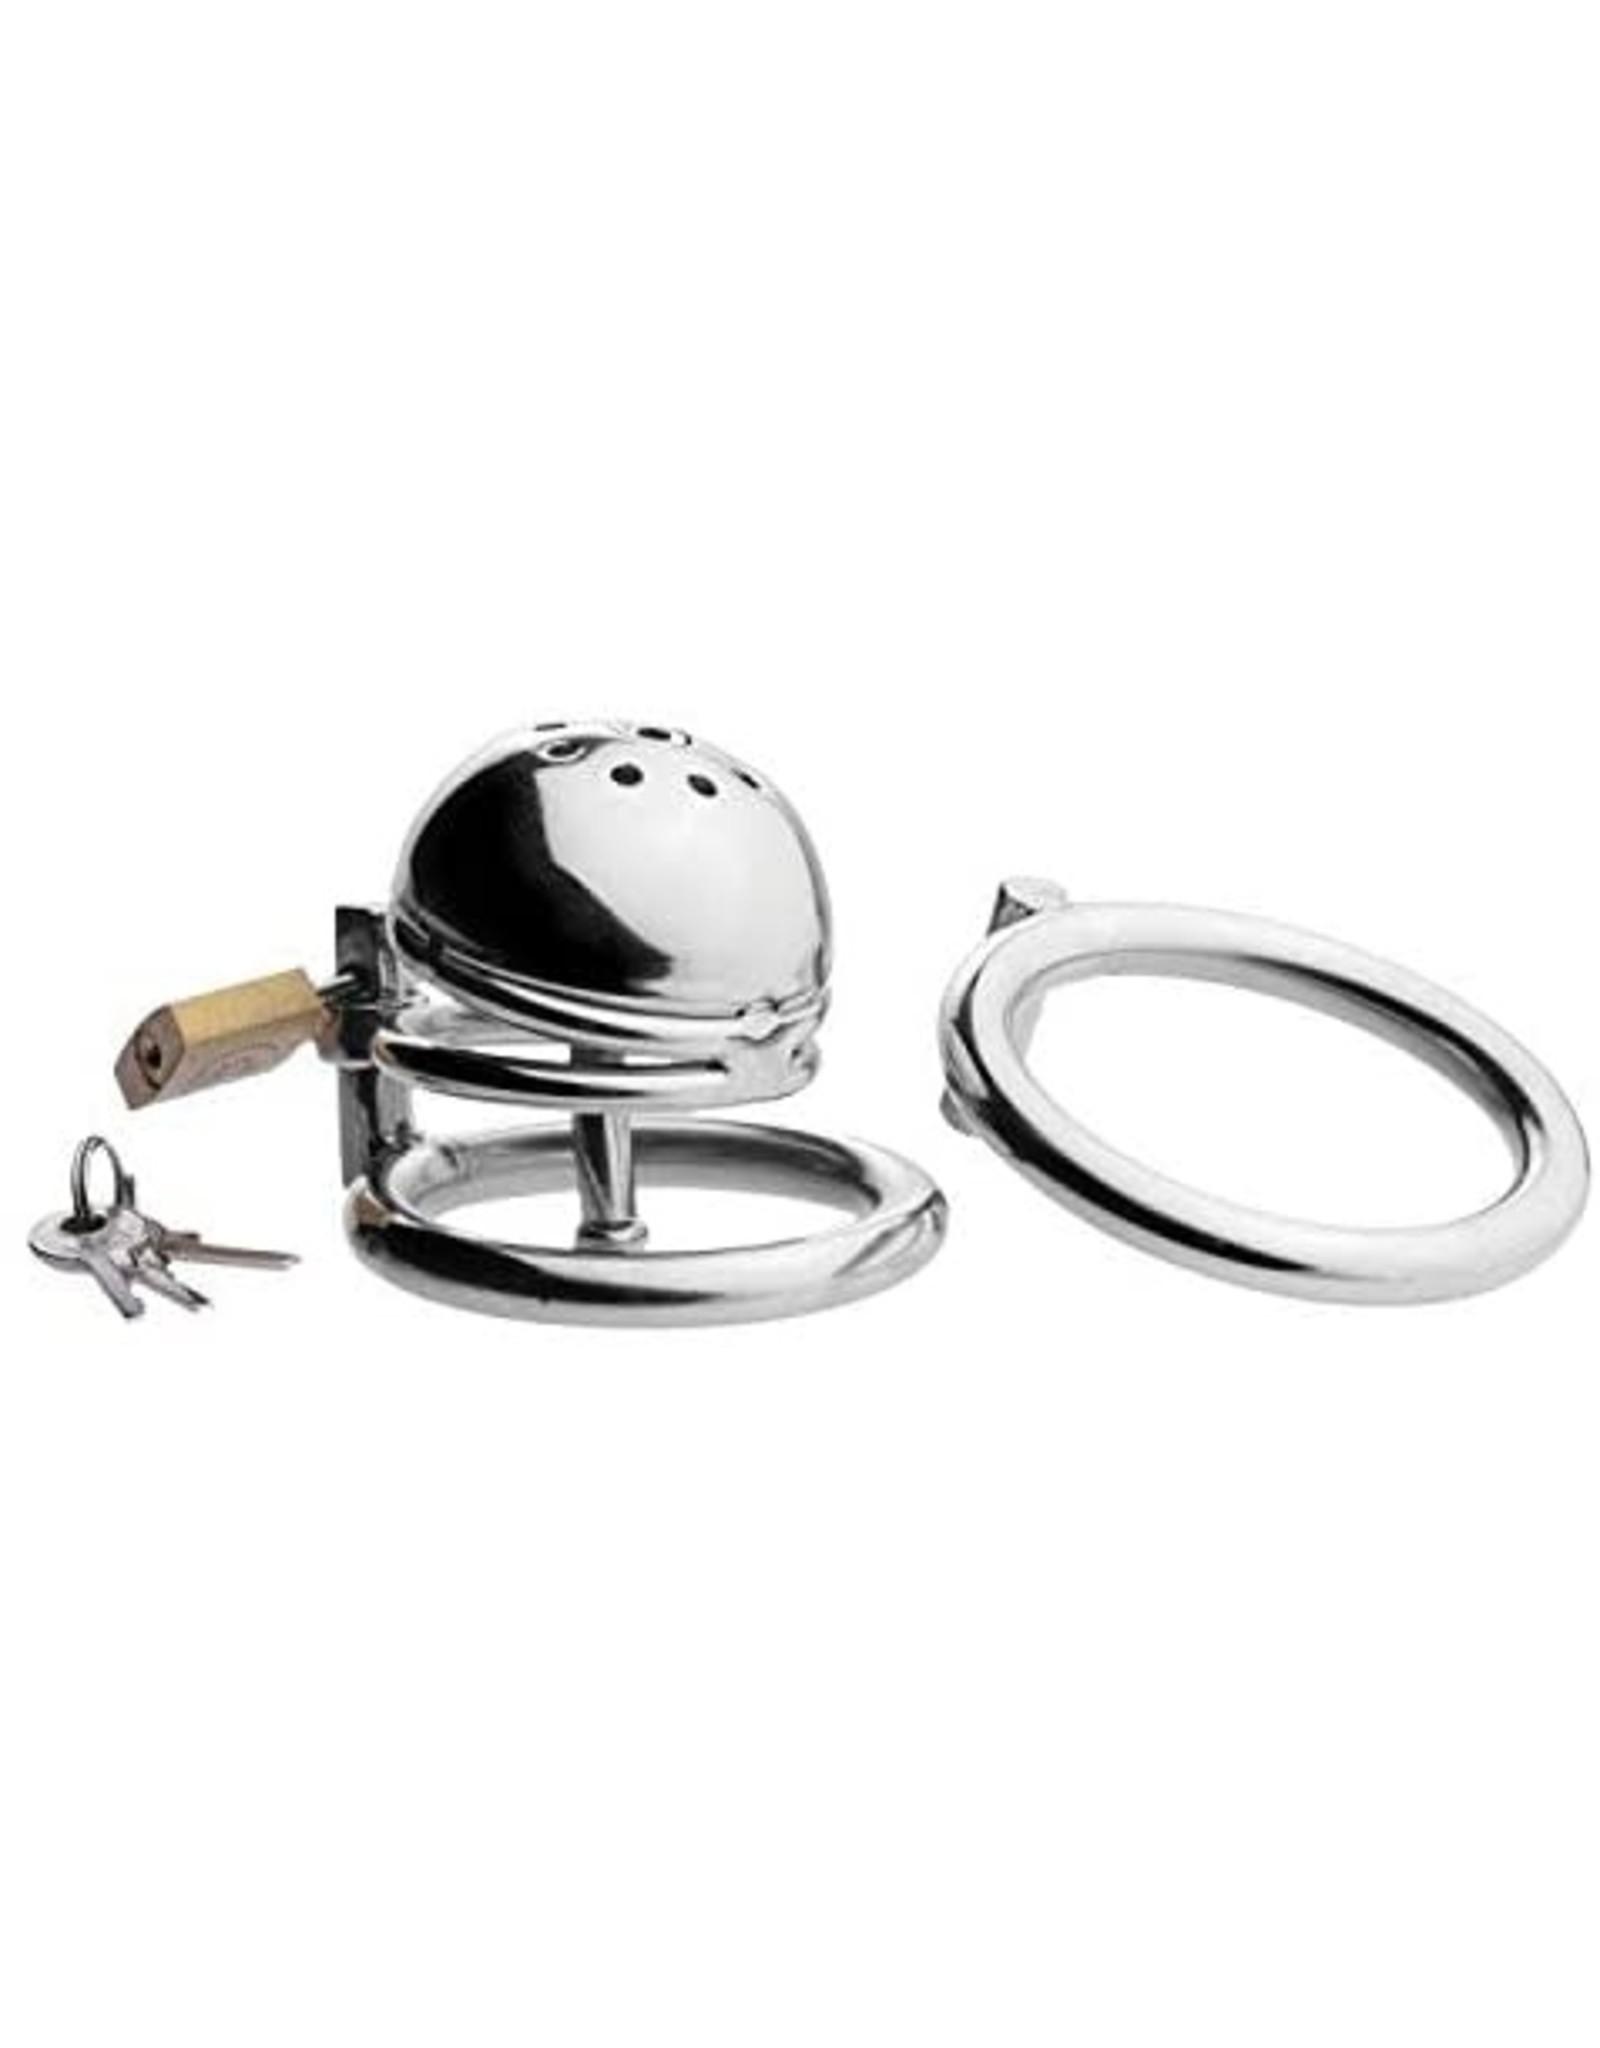 Master Series Master Series Solitary Plus Extreme Confinement Cage with Cum-Thru Plug